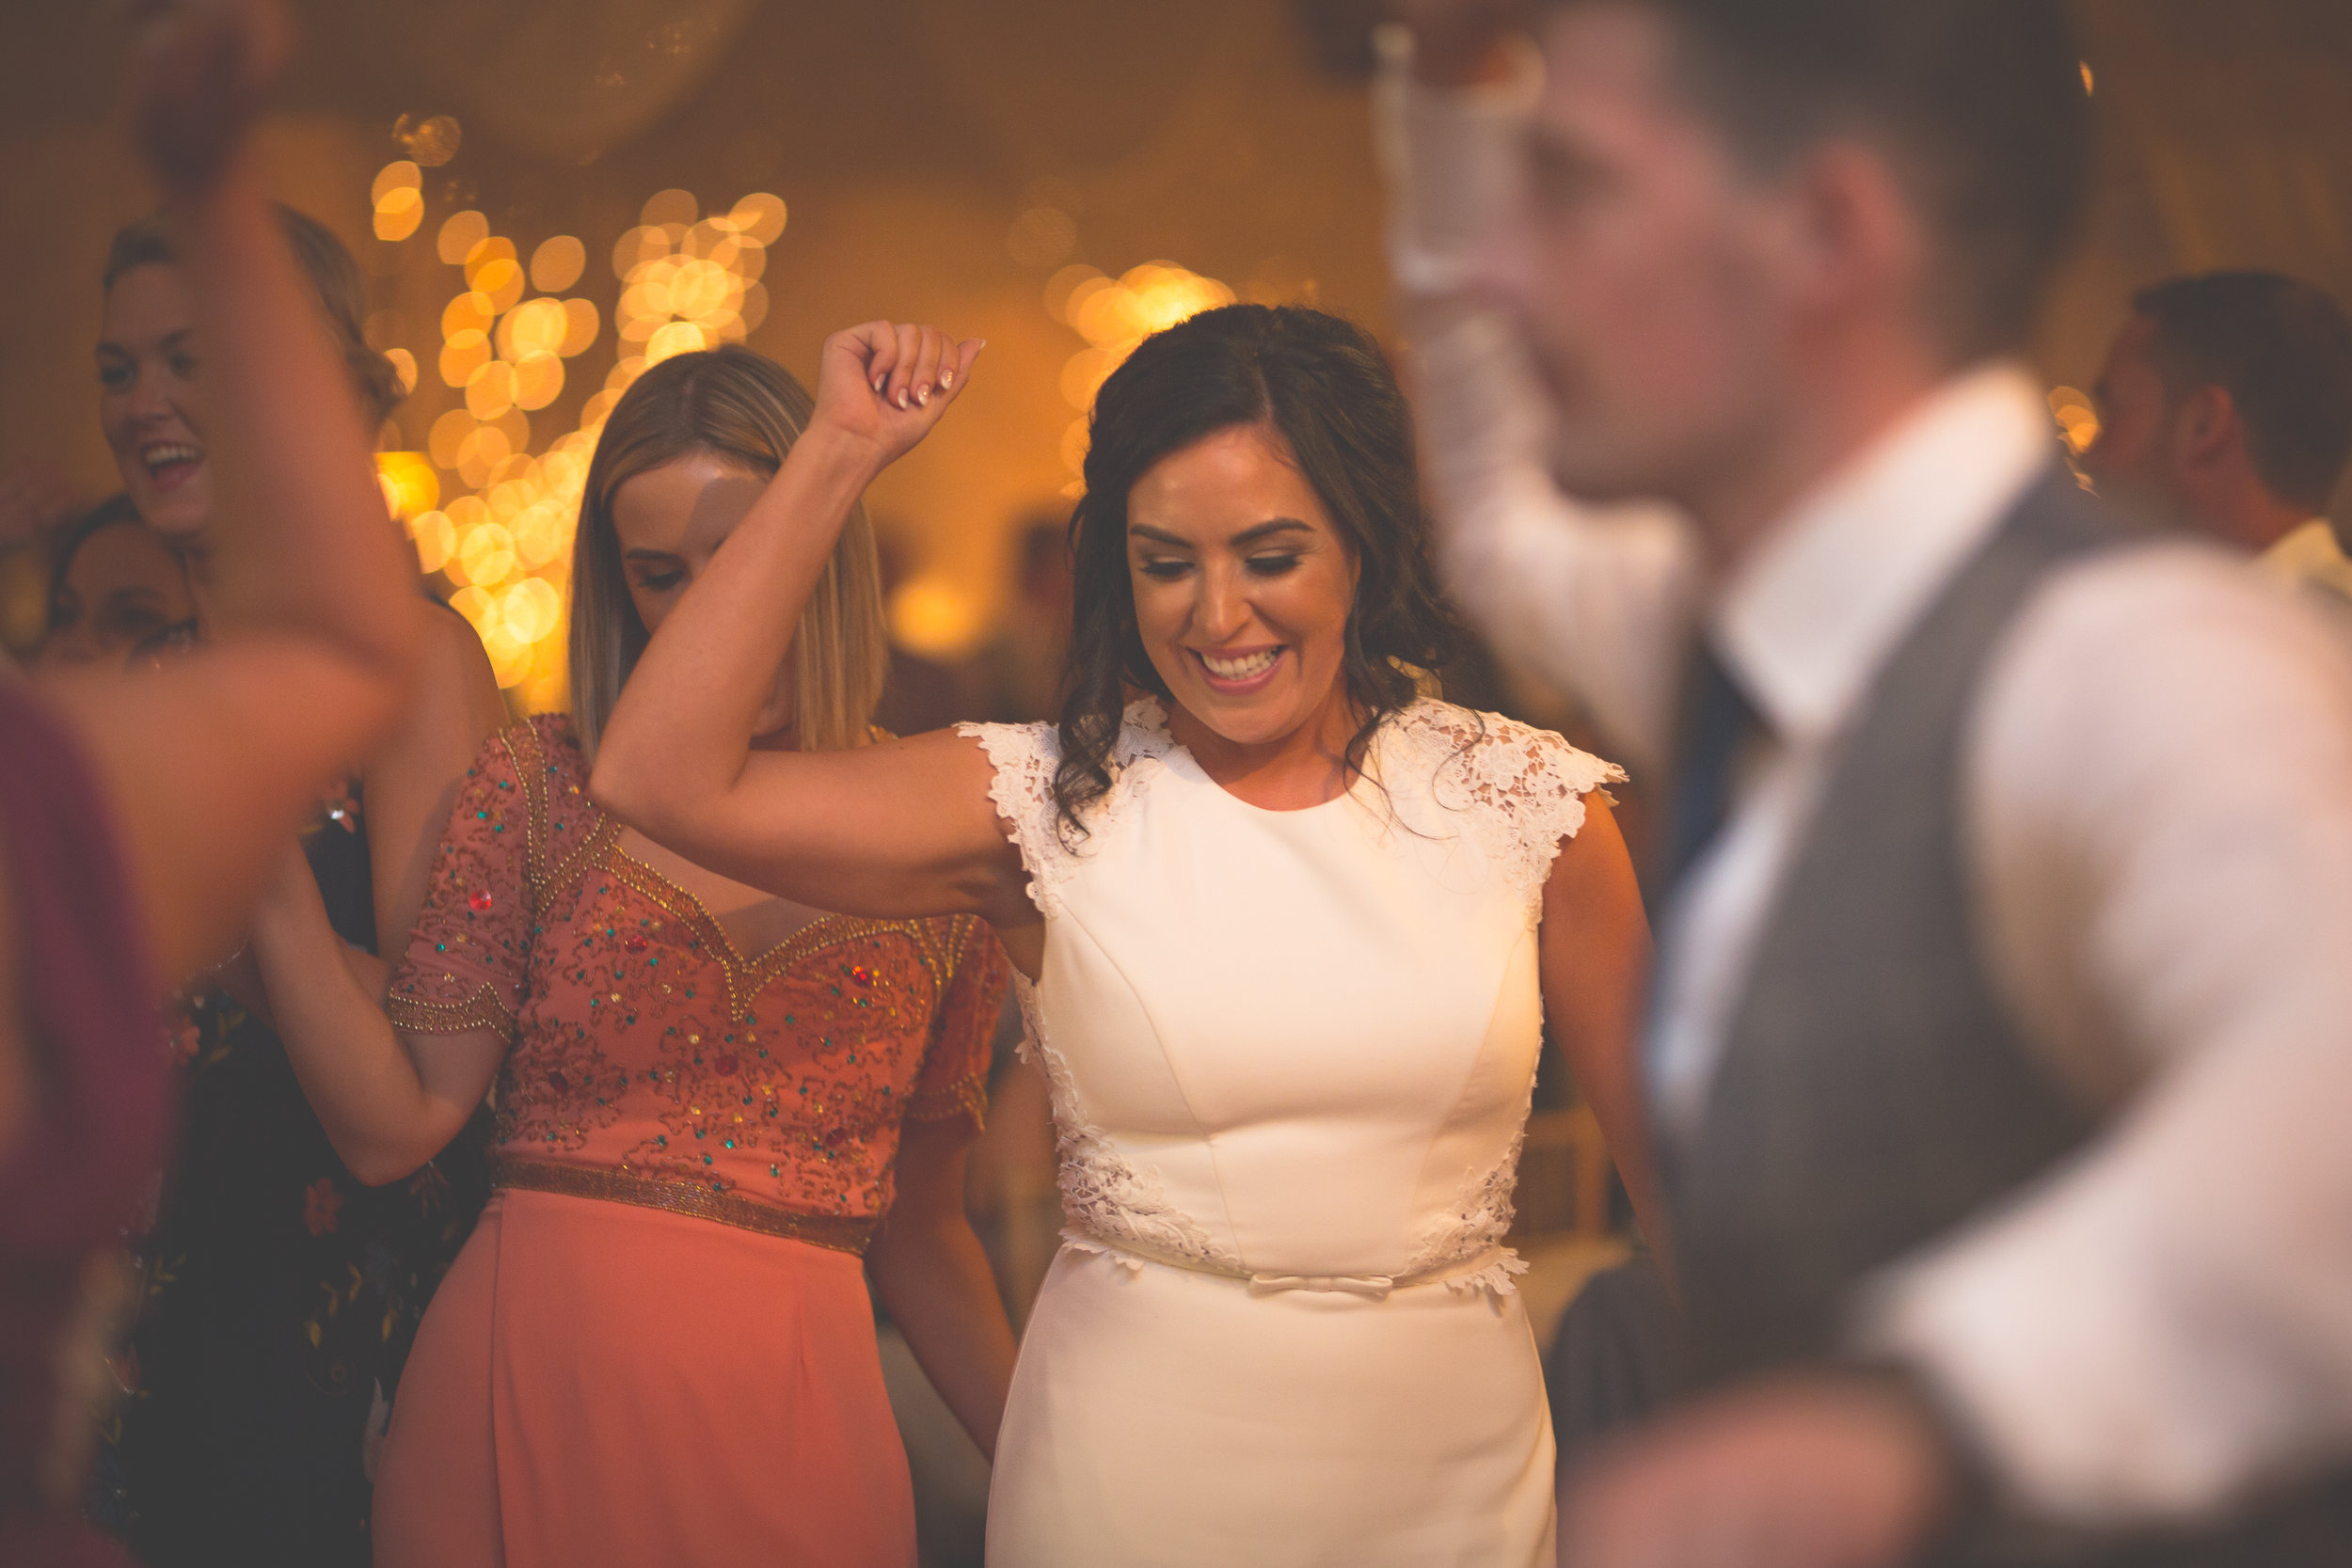 Brian McEwan Wedding Photography | Carol-Annee & Sean | The Dancing-60.jpg